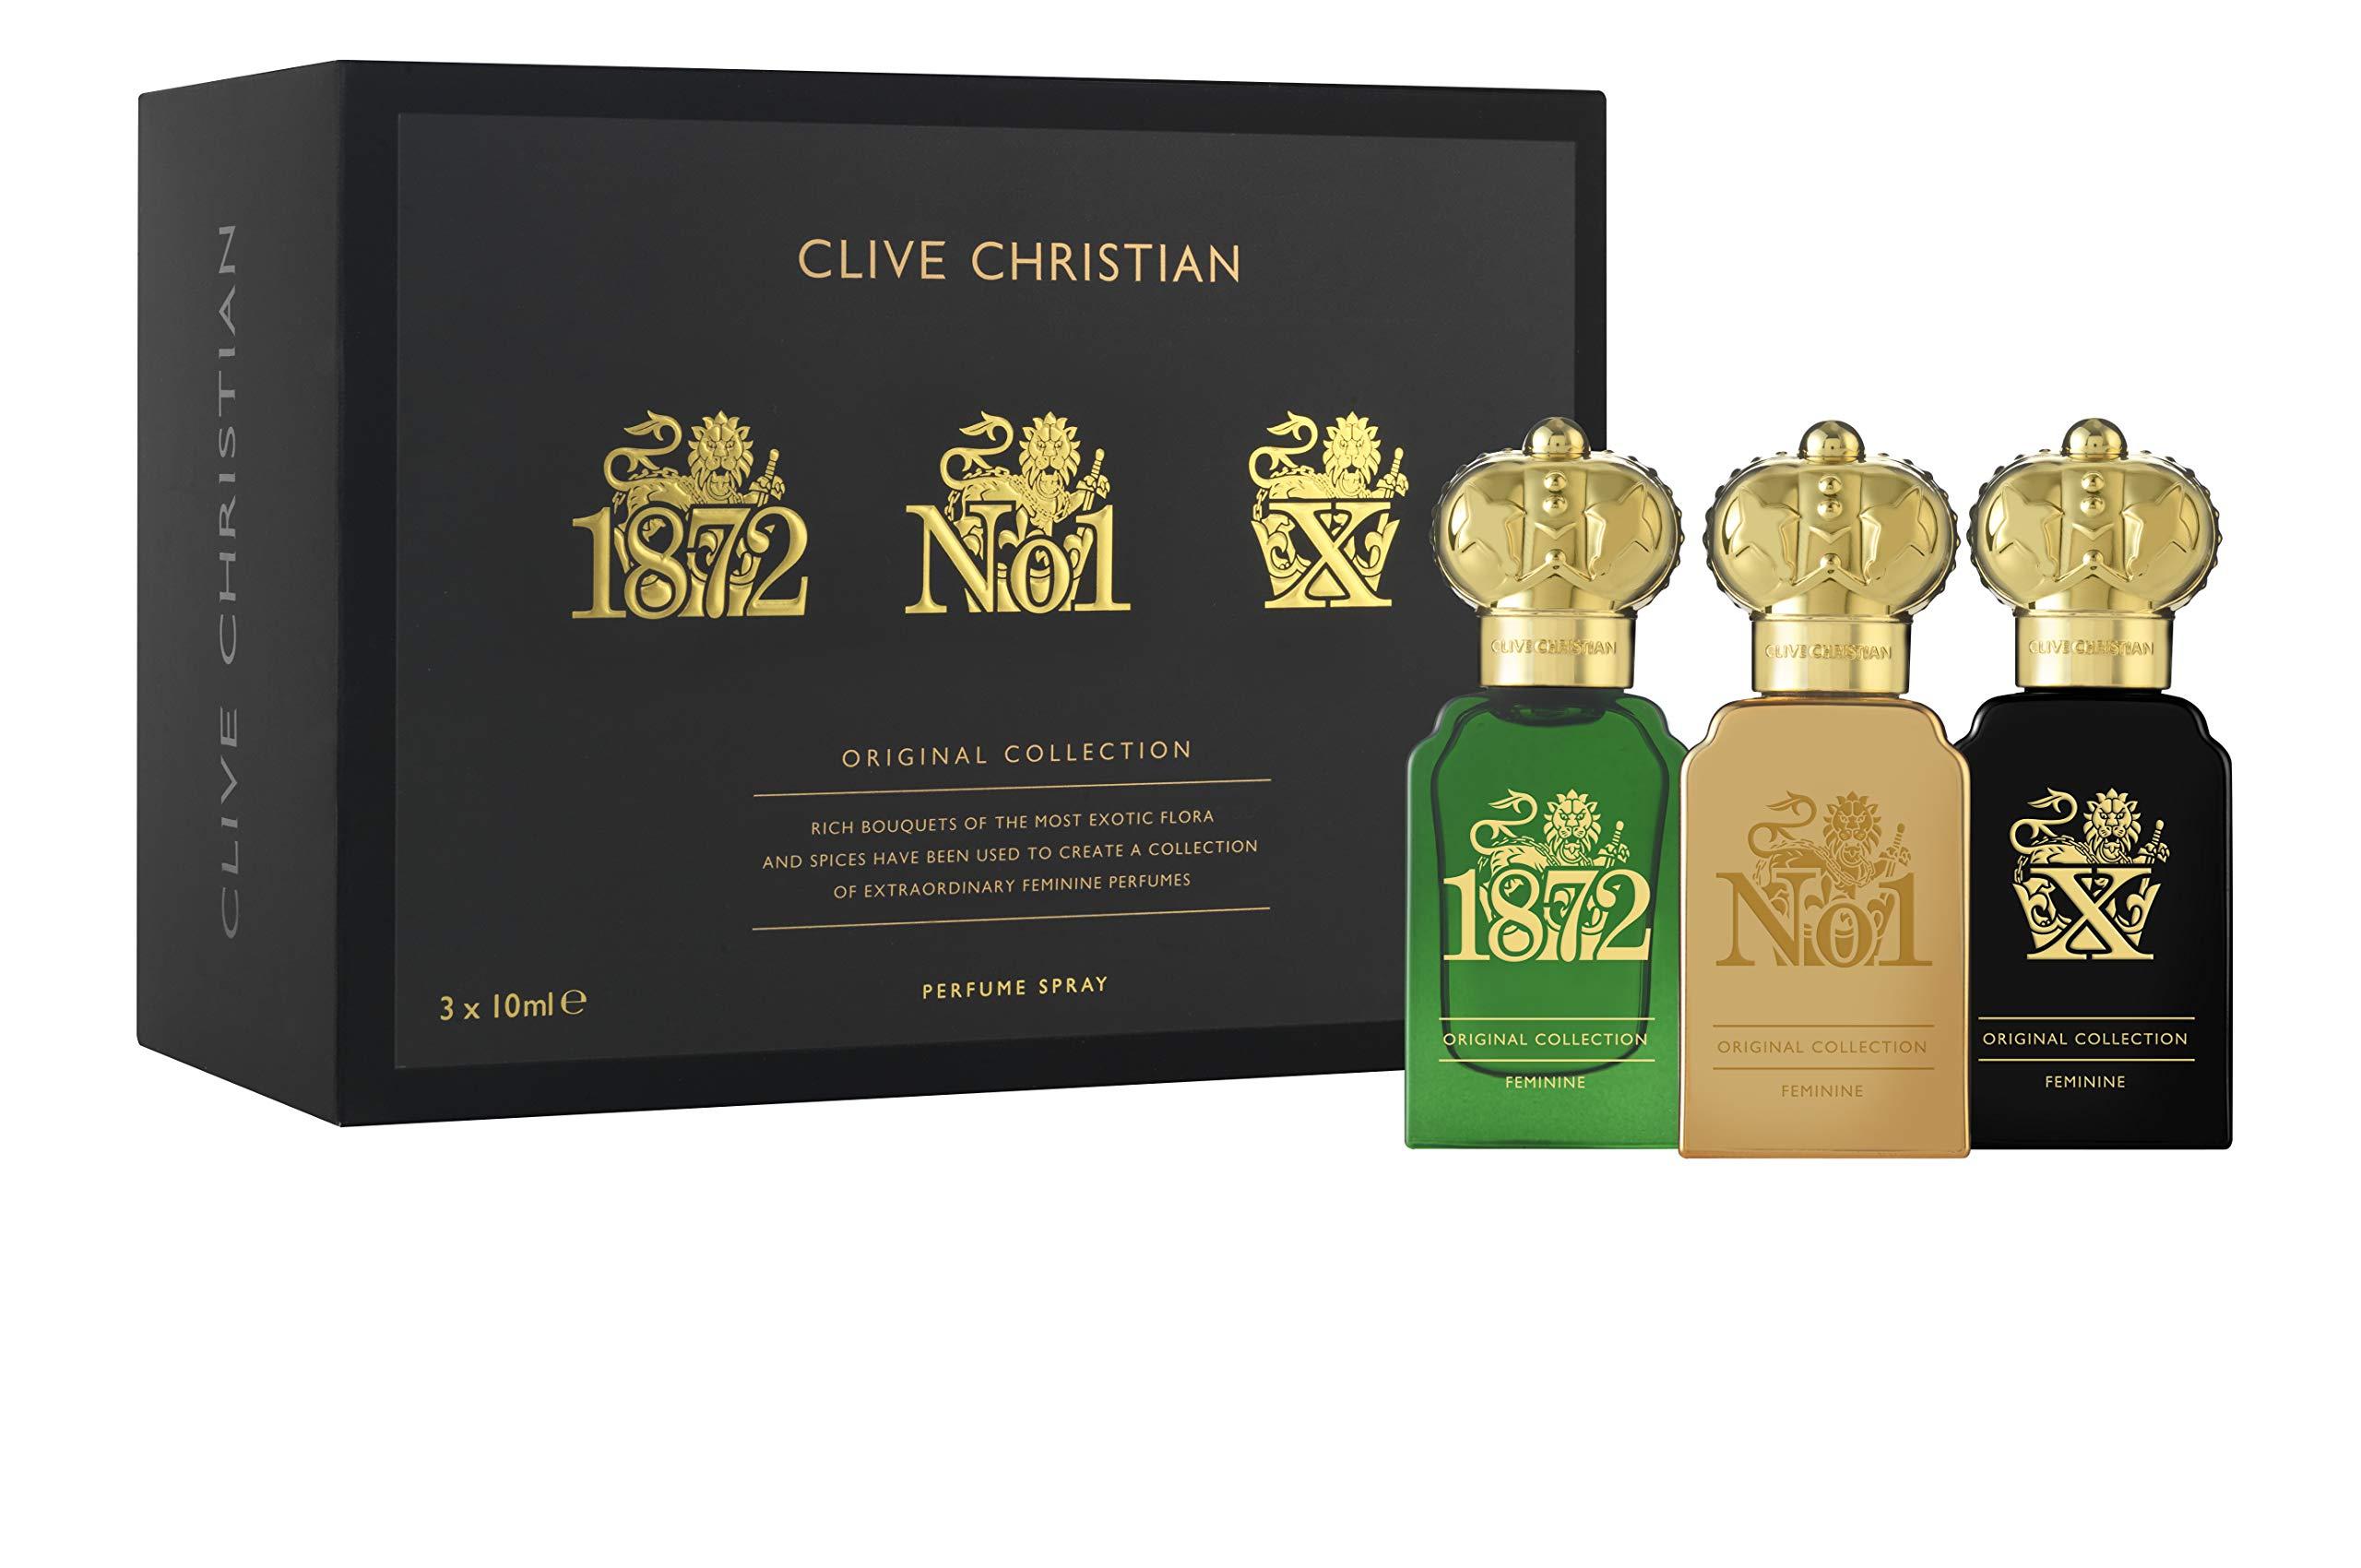 Nước Hoa Clive Christian